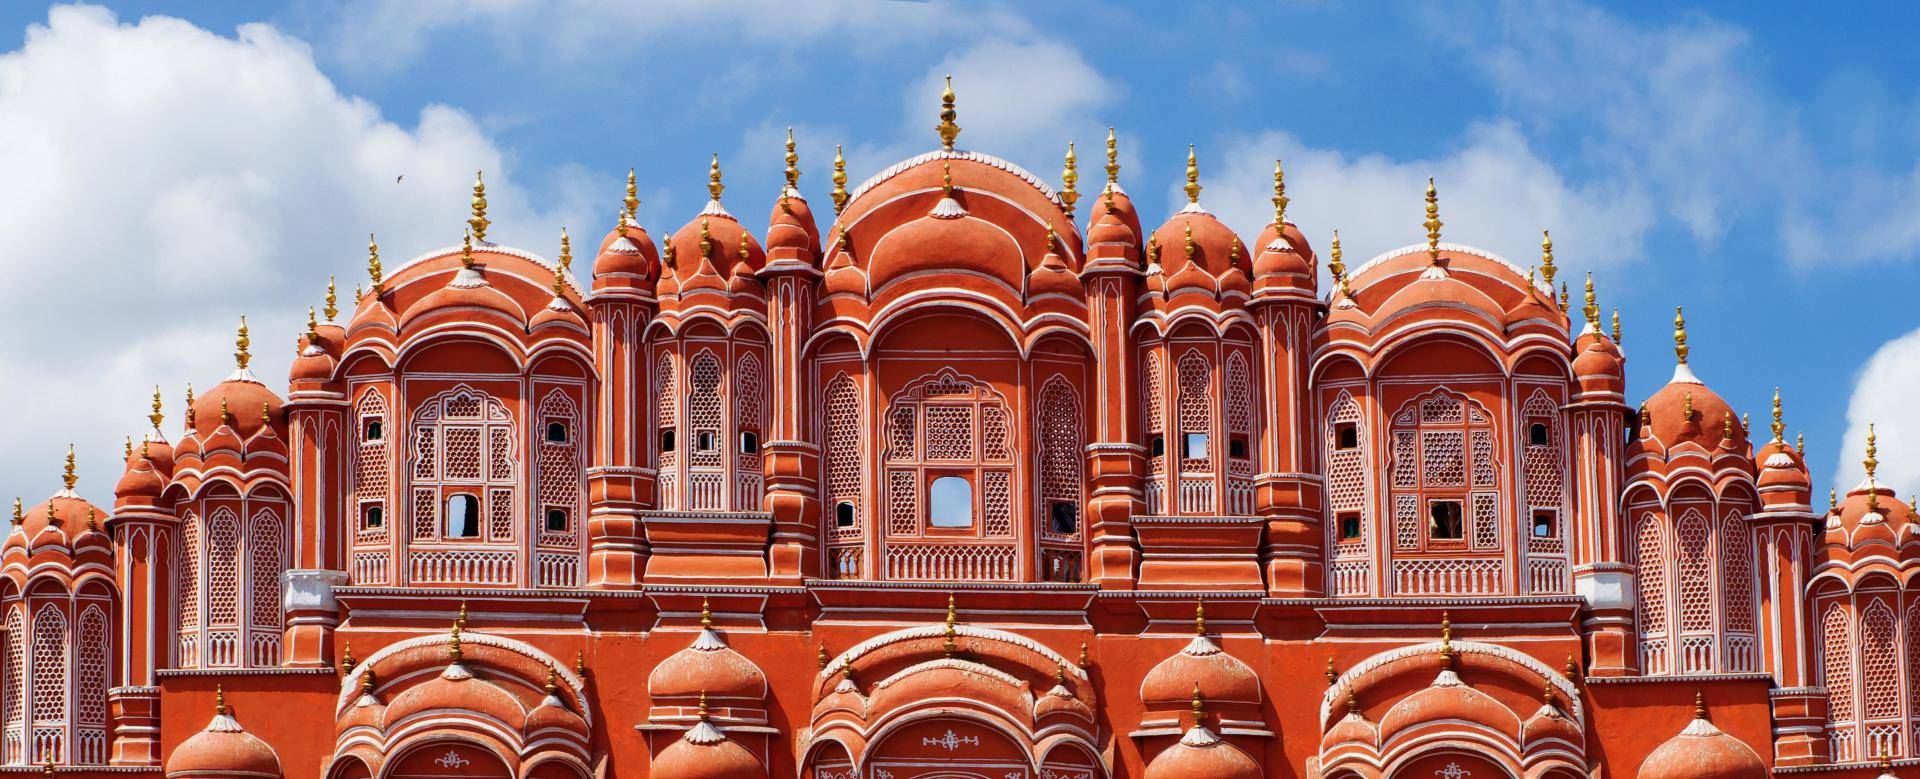 Voyage à pied : Rajasthan : ville rose, ville blanche